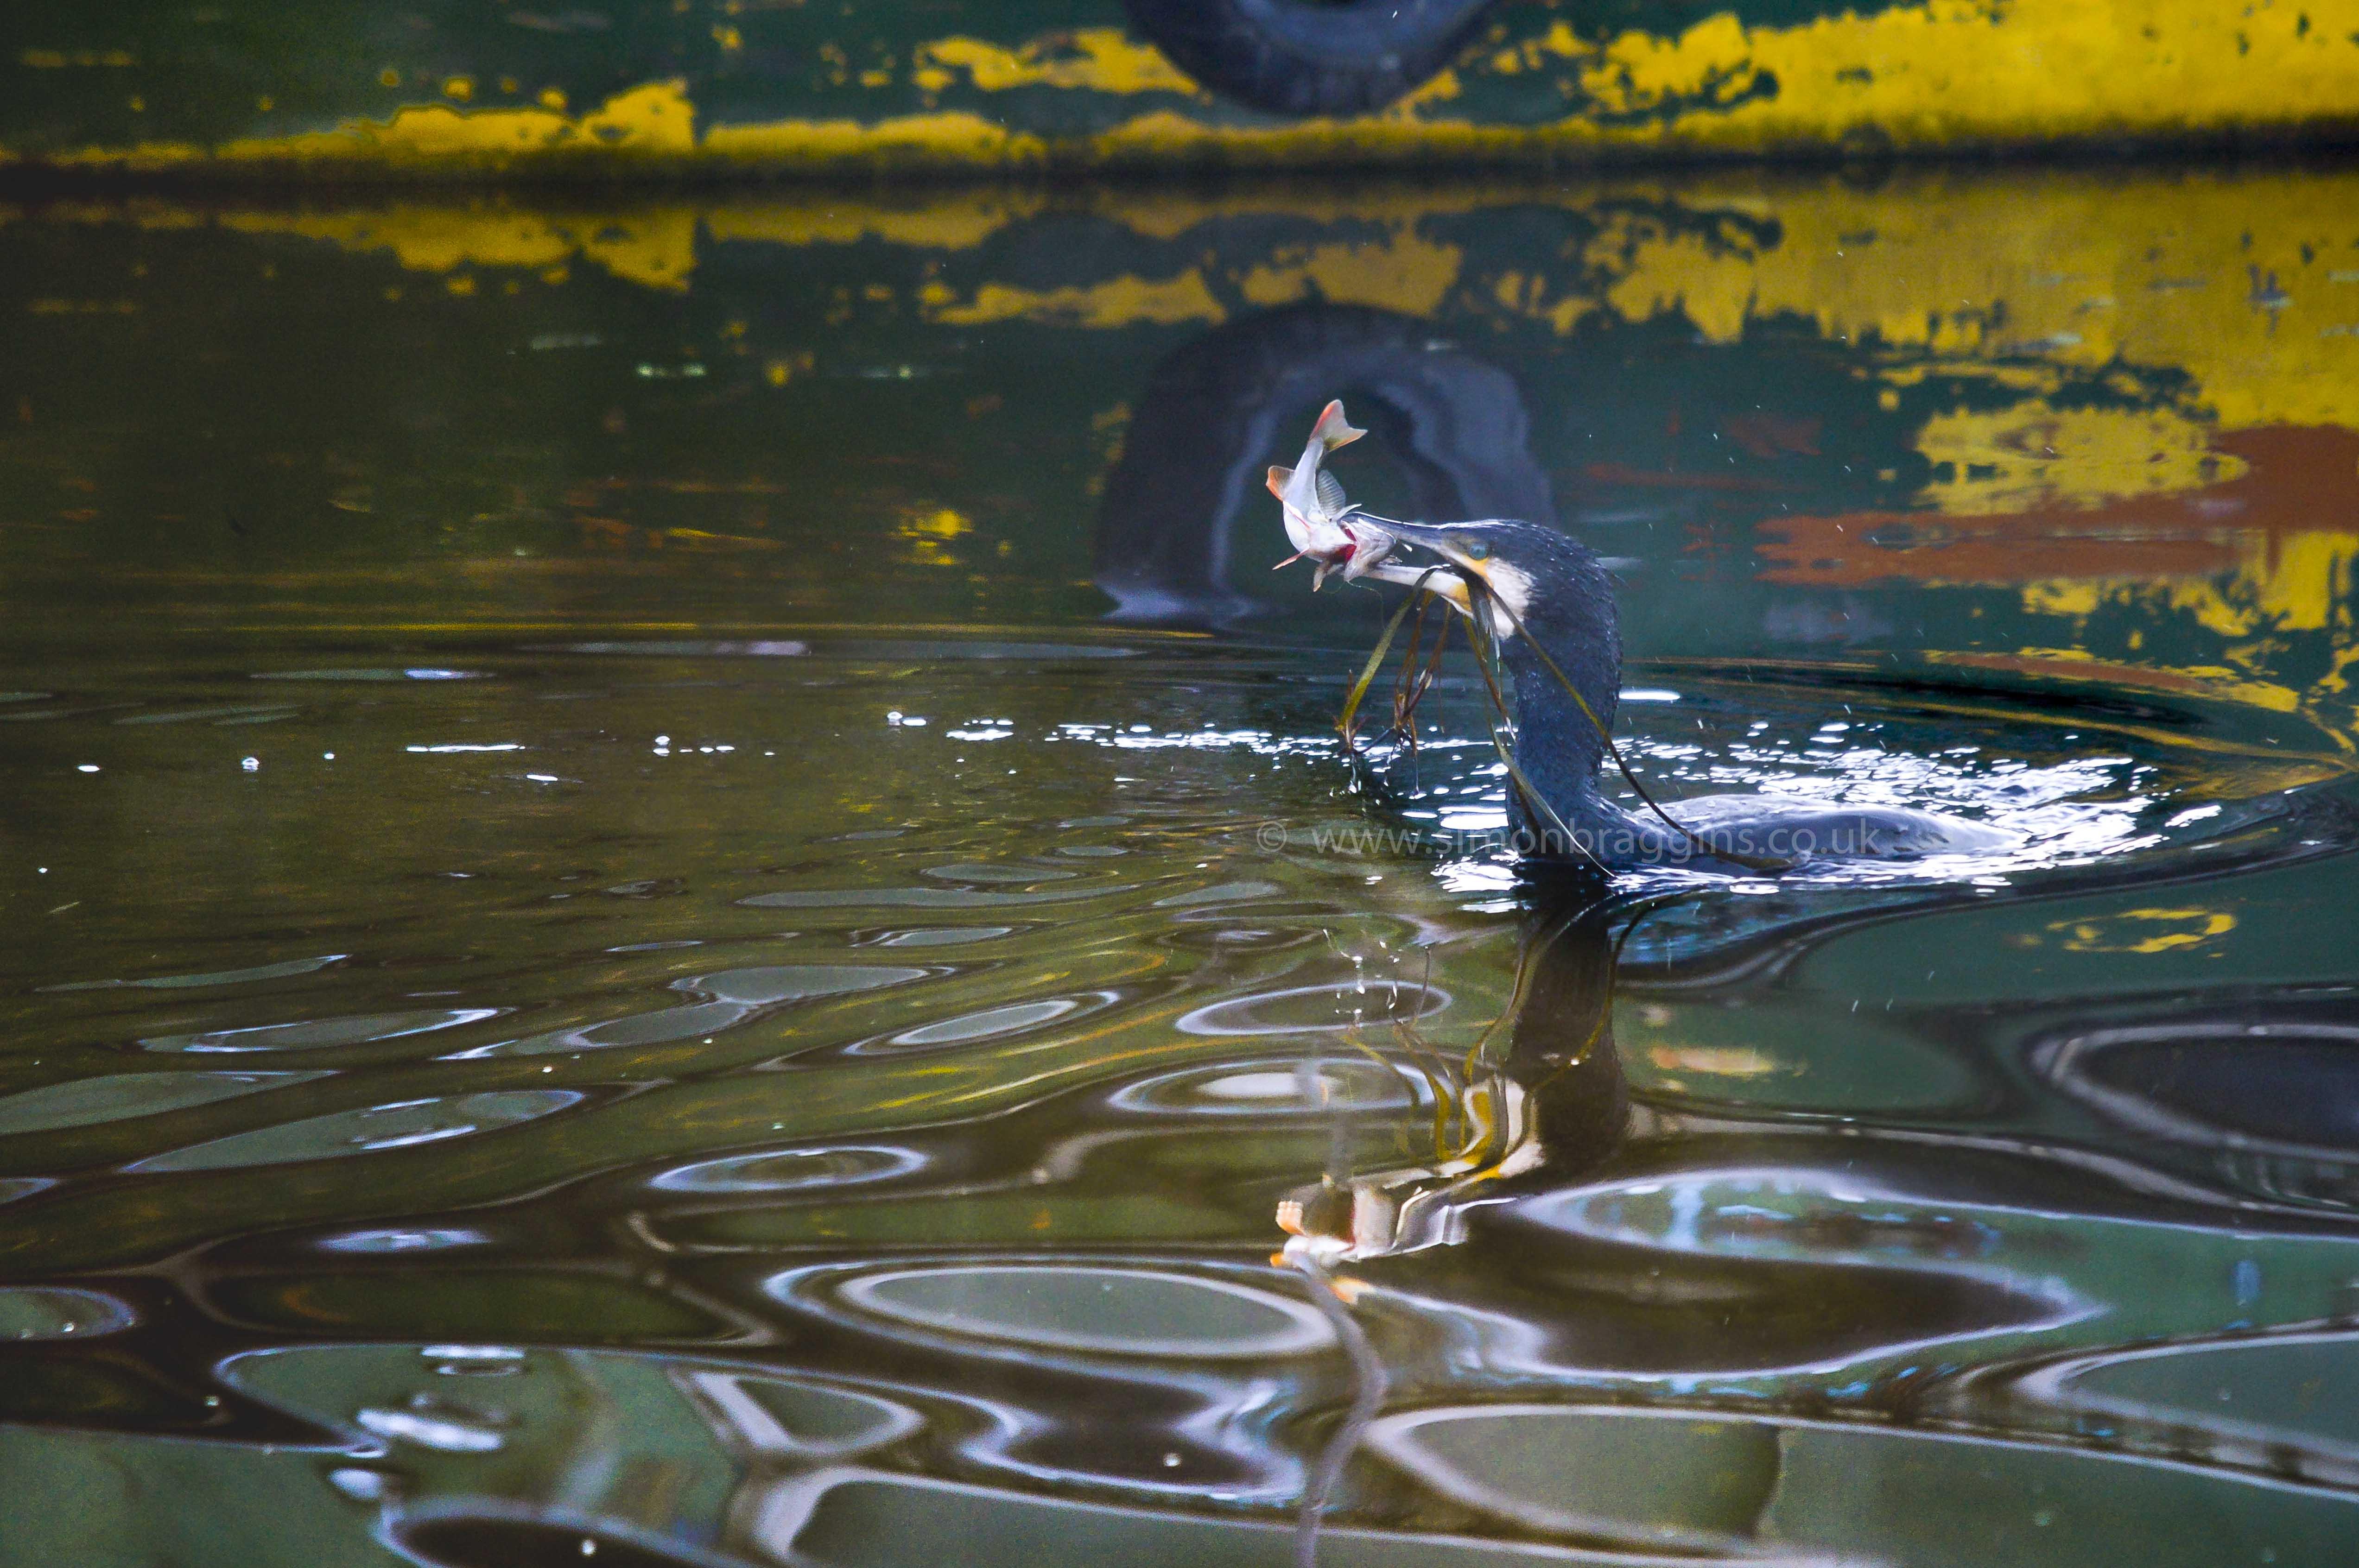 Breakfast: A cormorant's early morning success - Tottenham Hale, December 2016